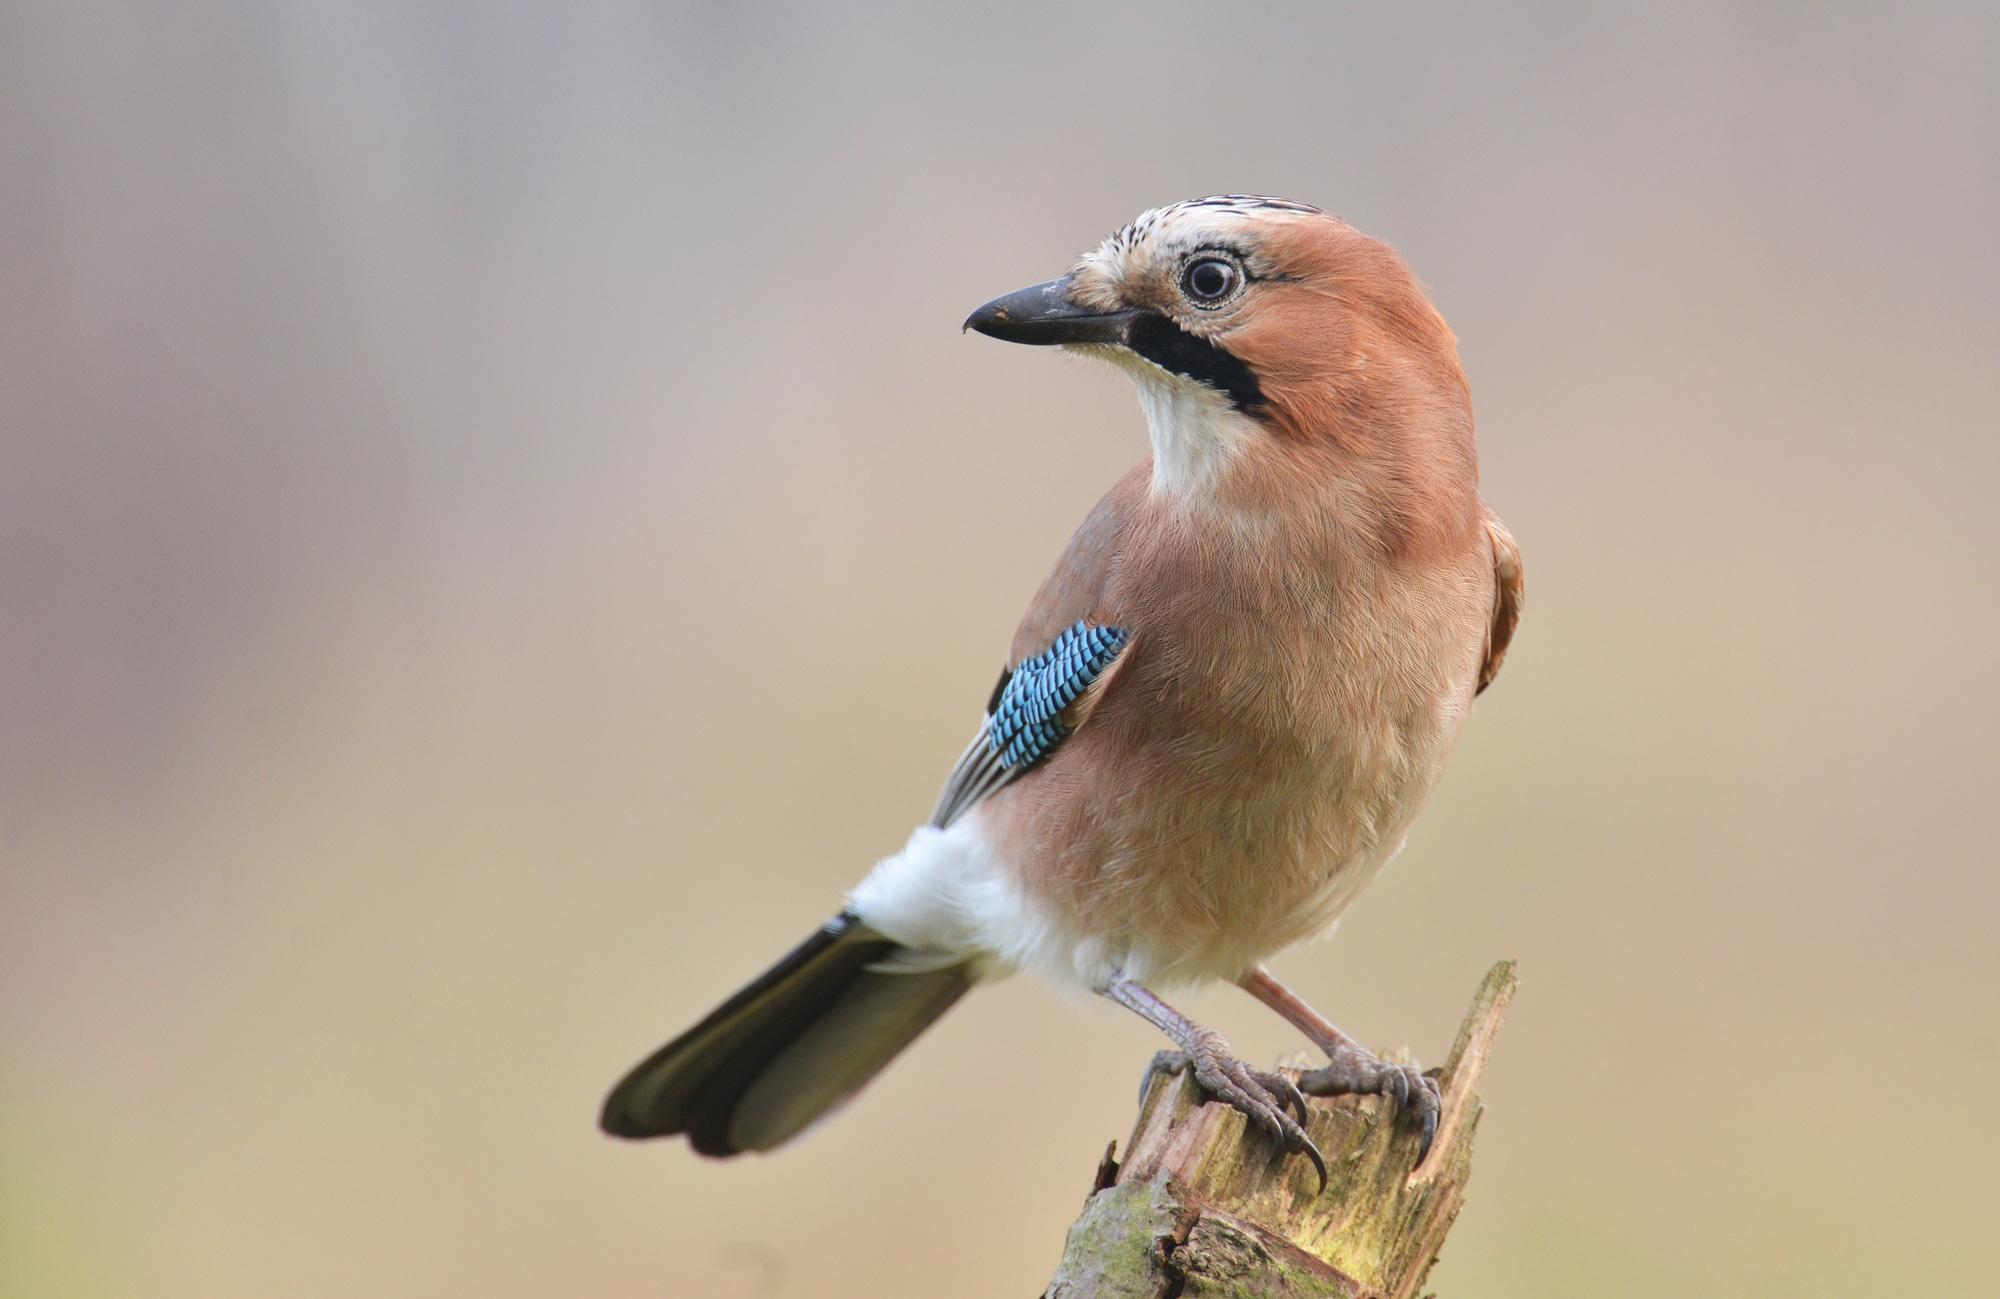 Jay bird on branch